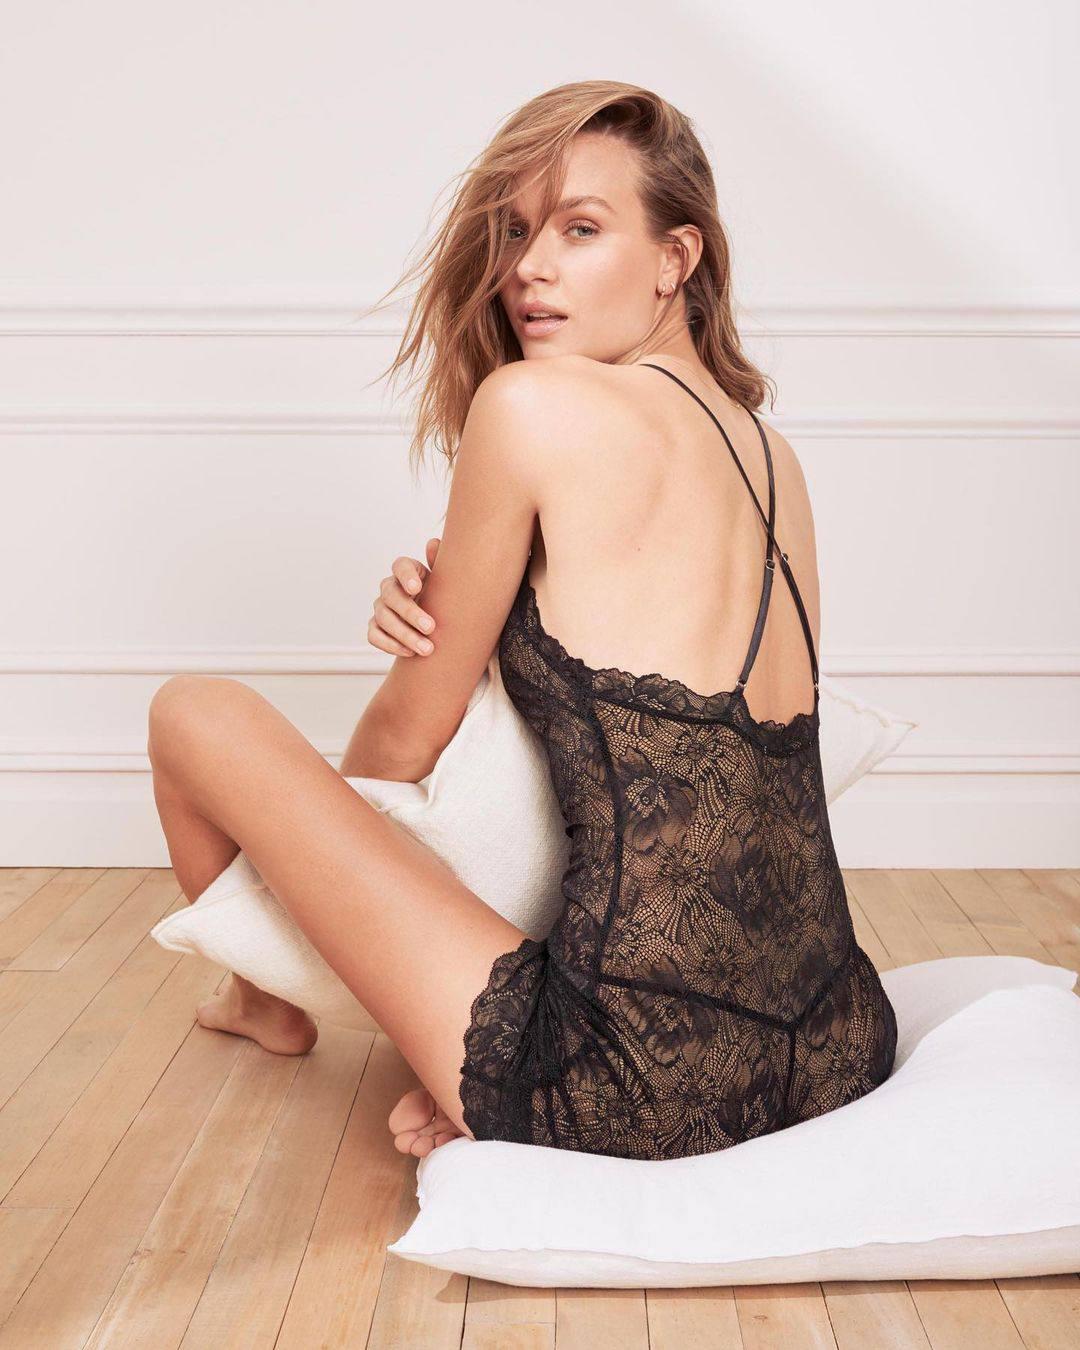 Josephine Skriver Sexy Lingerie